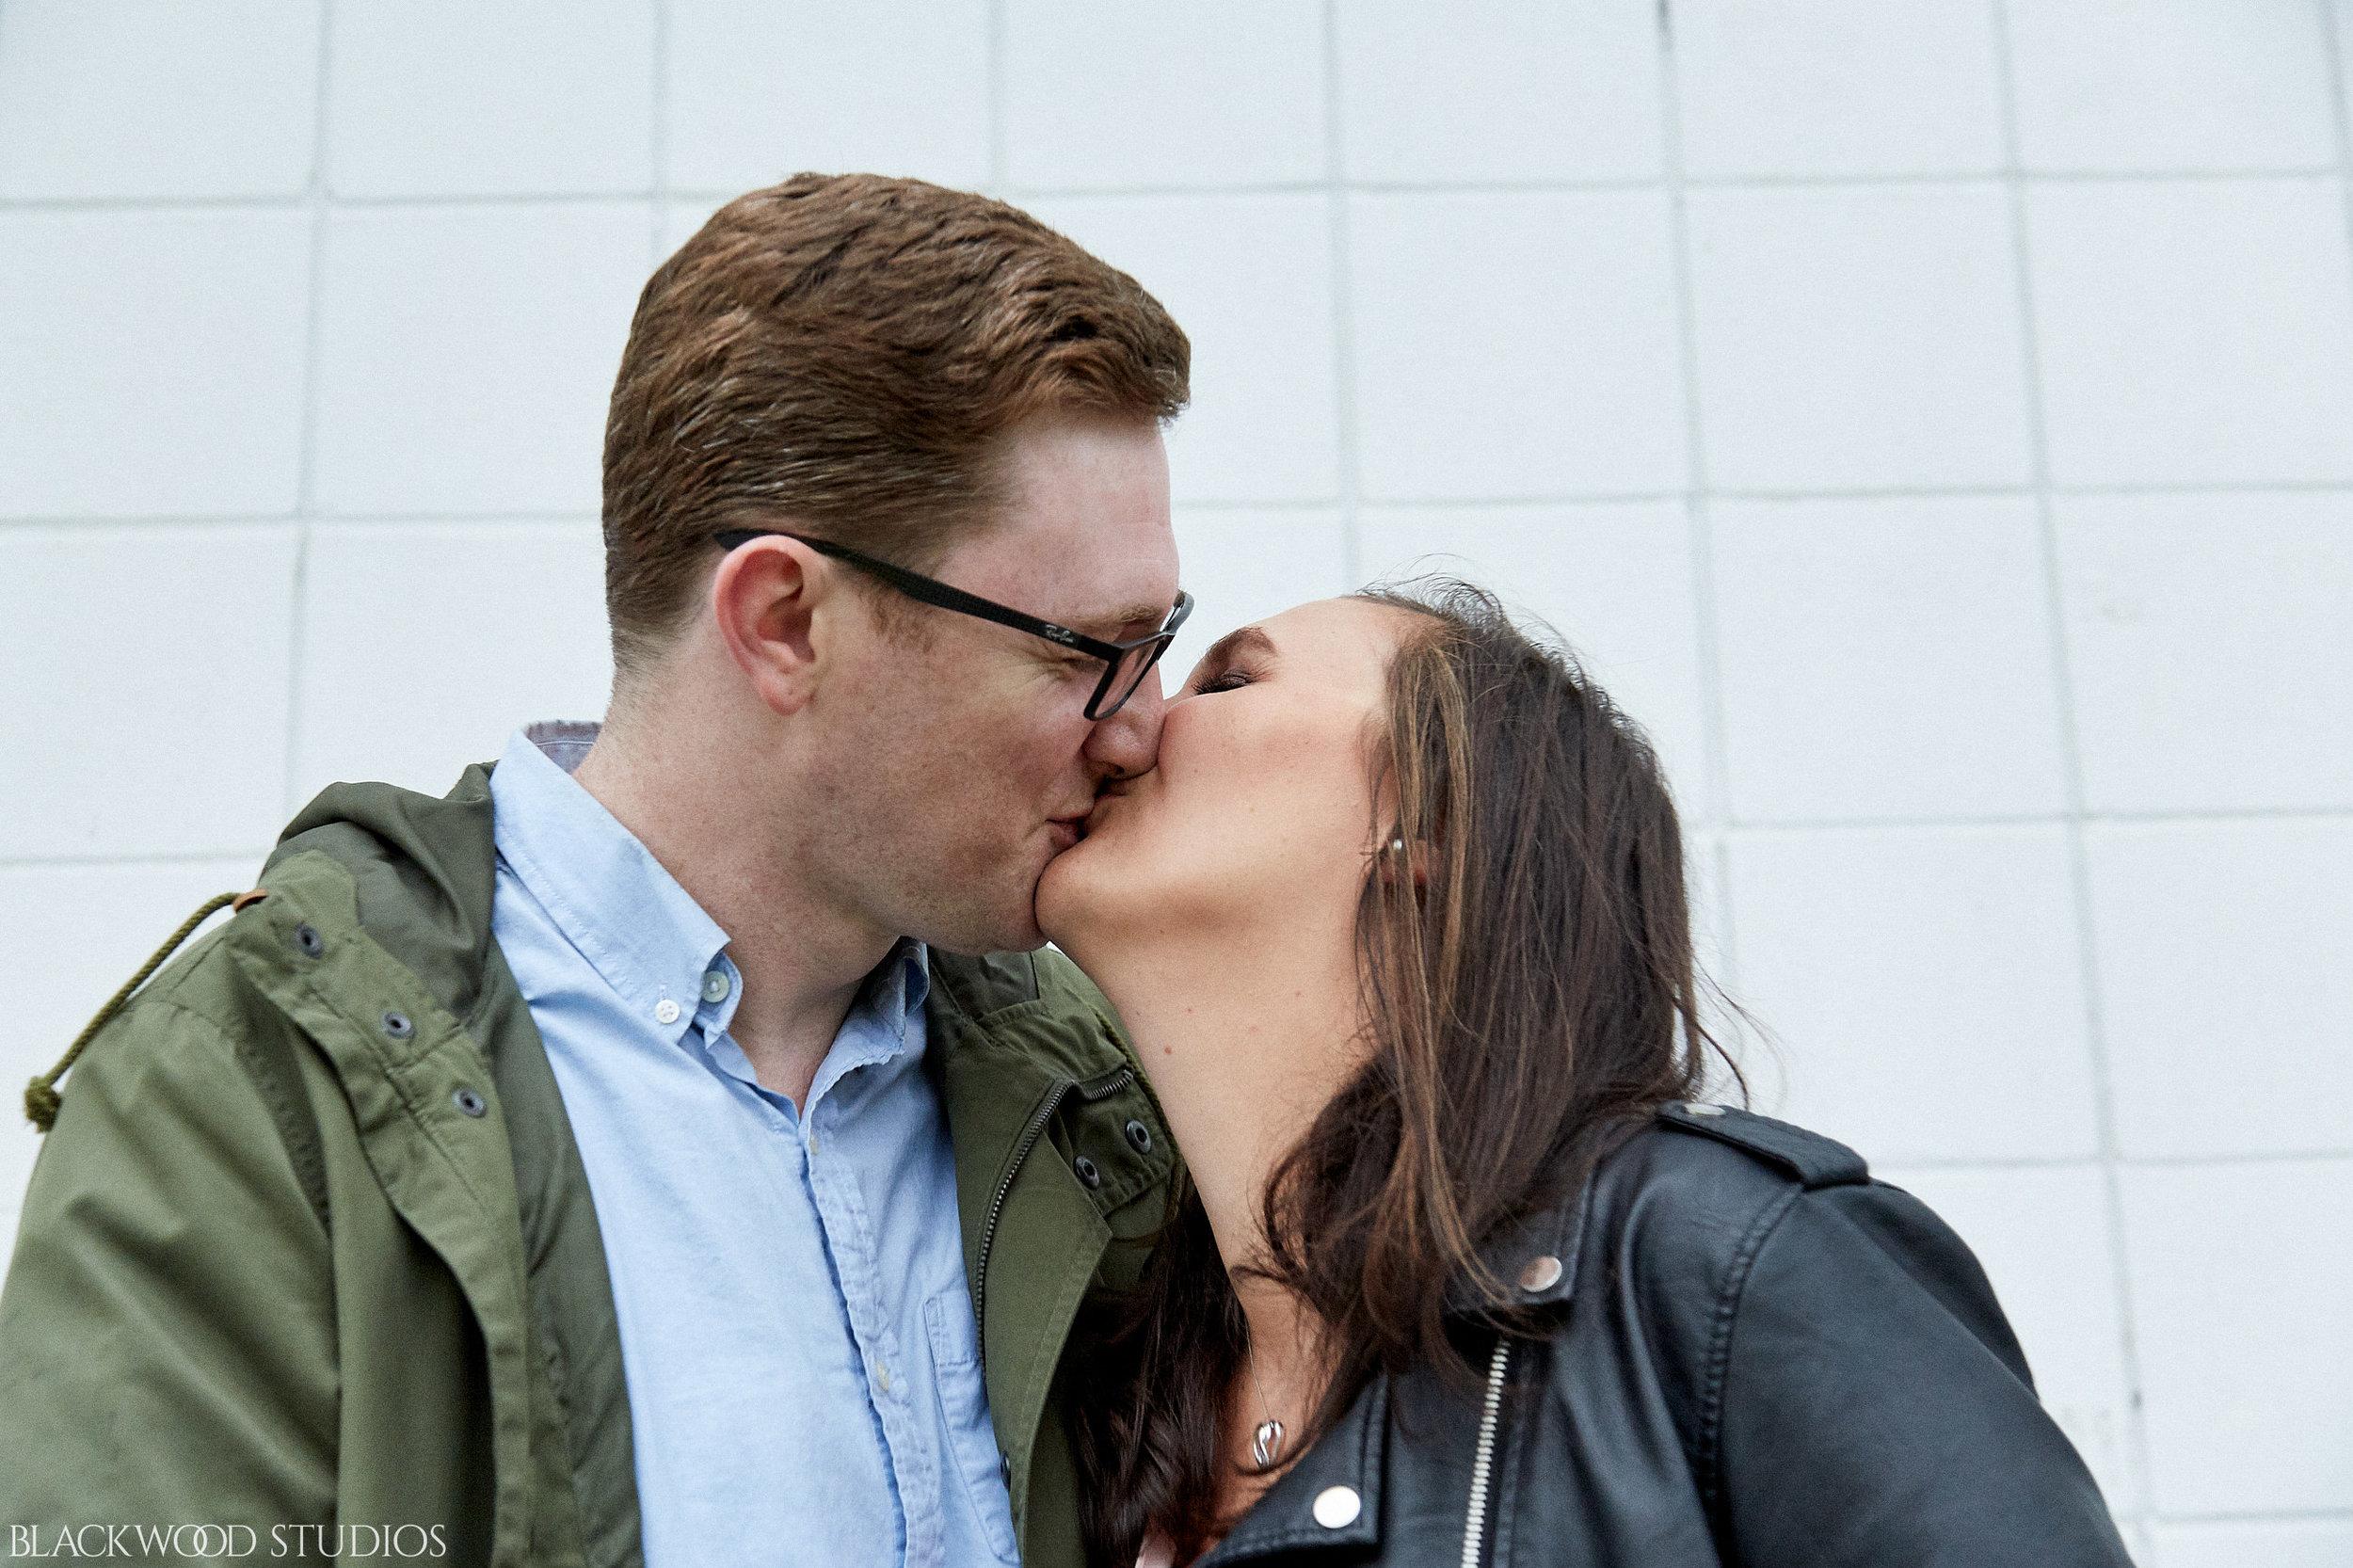 Blackwood-Studios-20181008-18-16-24-Justin-and-Samantha-Engagement-Photography-foggy-Scaraborough-Bluffs-Park-Ontario.jpg